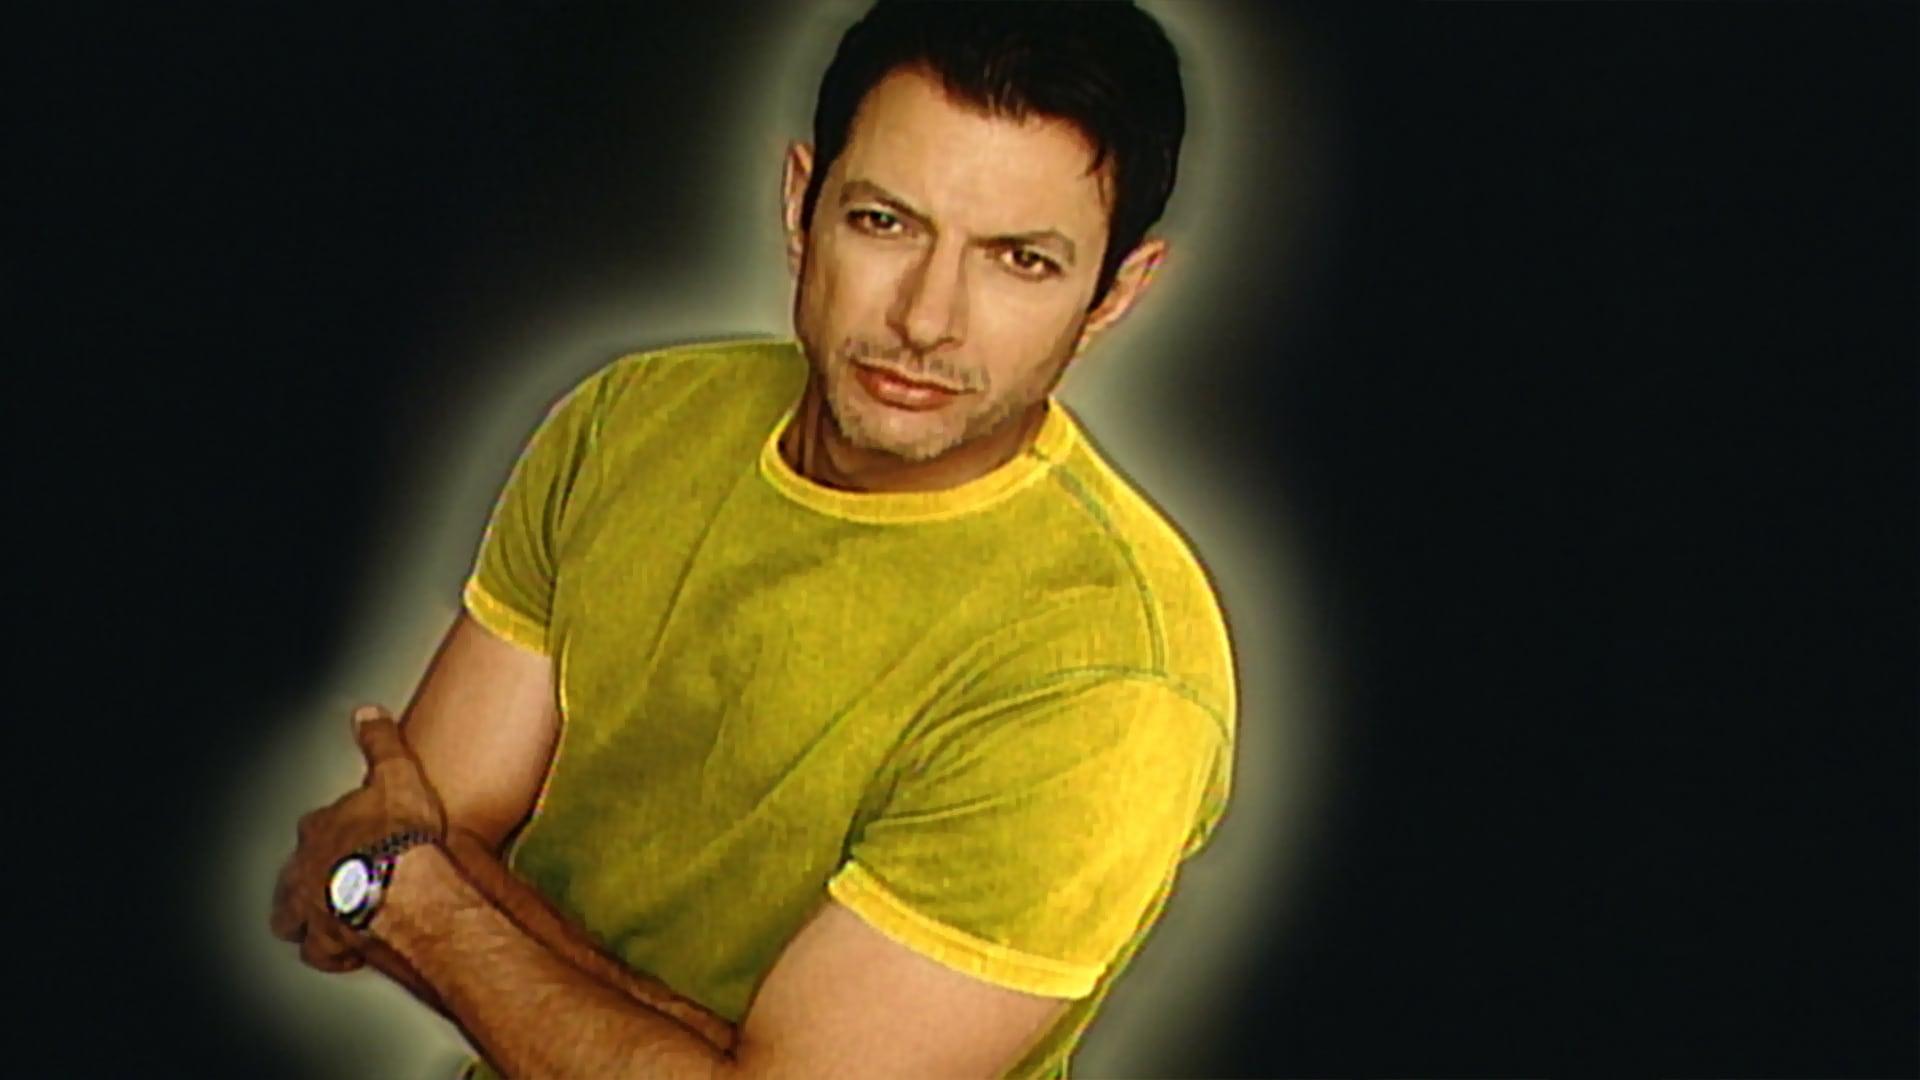 Jeff Goldblum: May 17, 1997